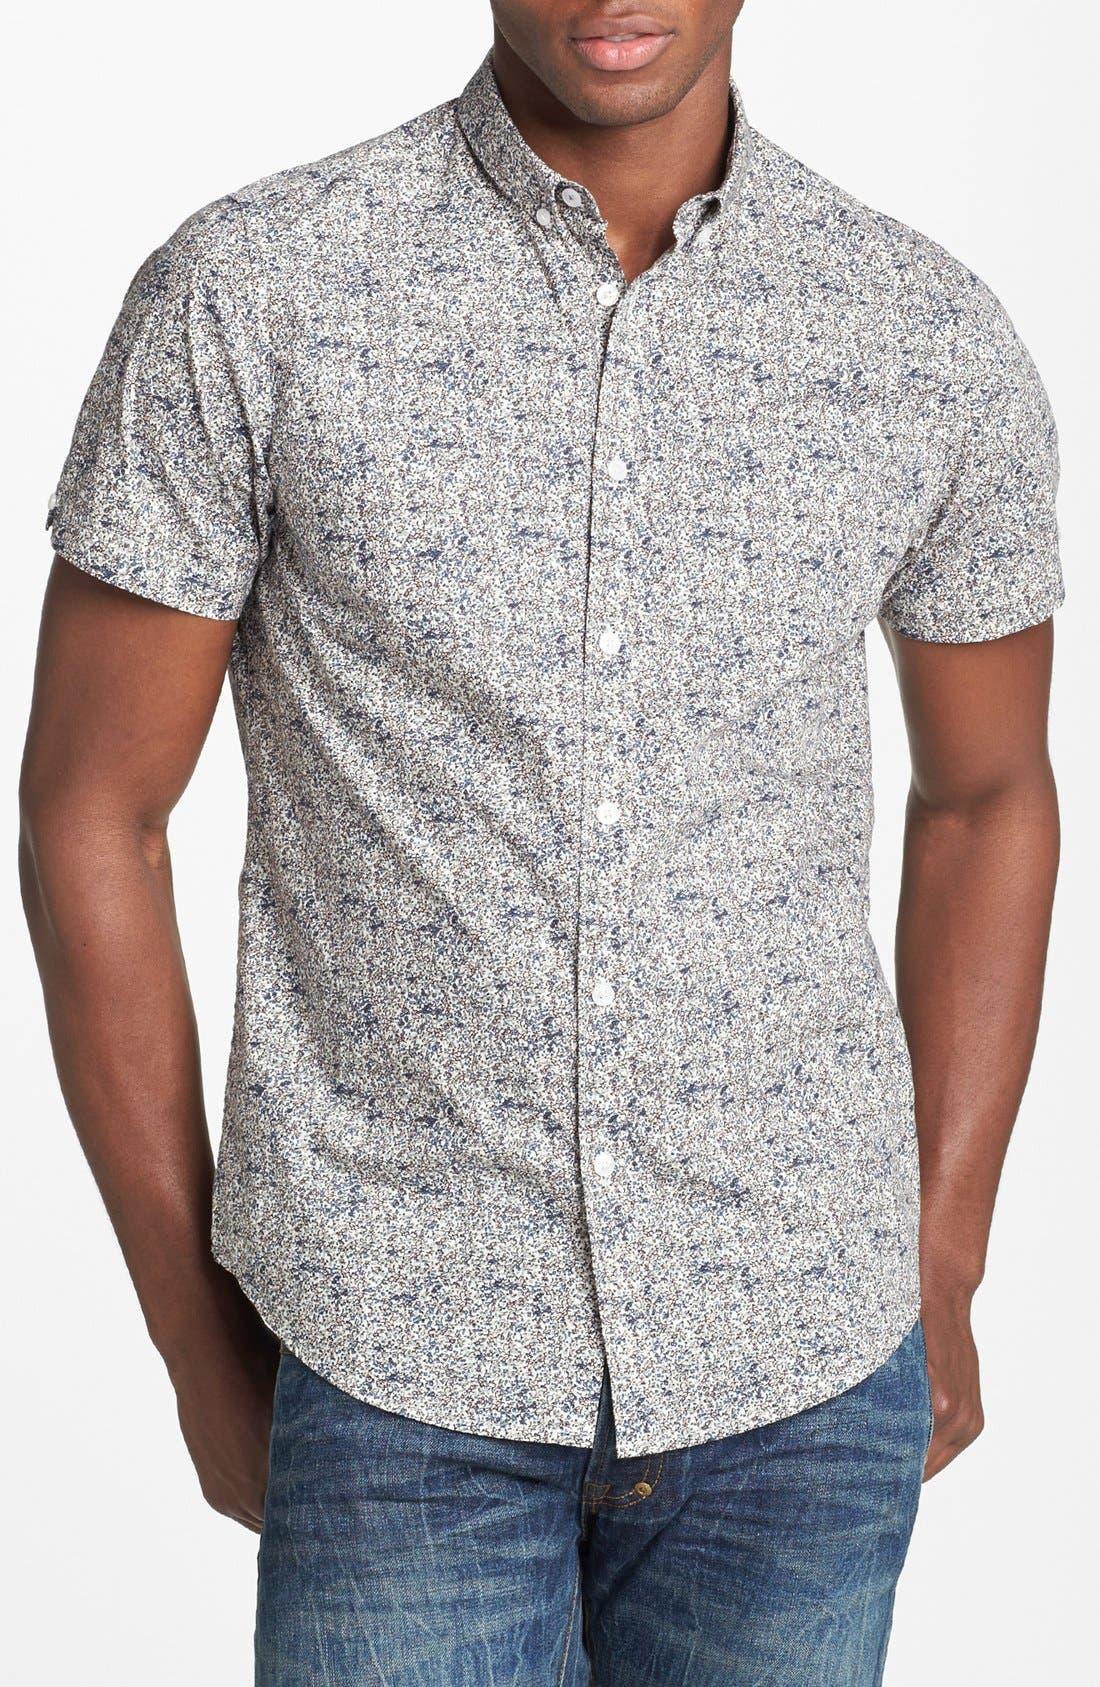 Main Image - Ben Sherman Floral Print Short Sleeve Woven Shirt